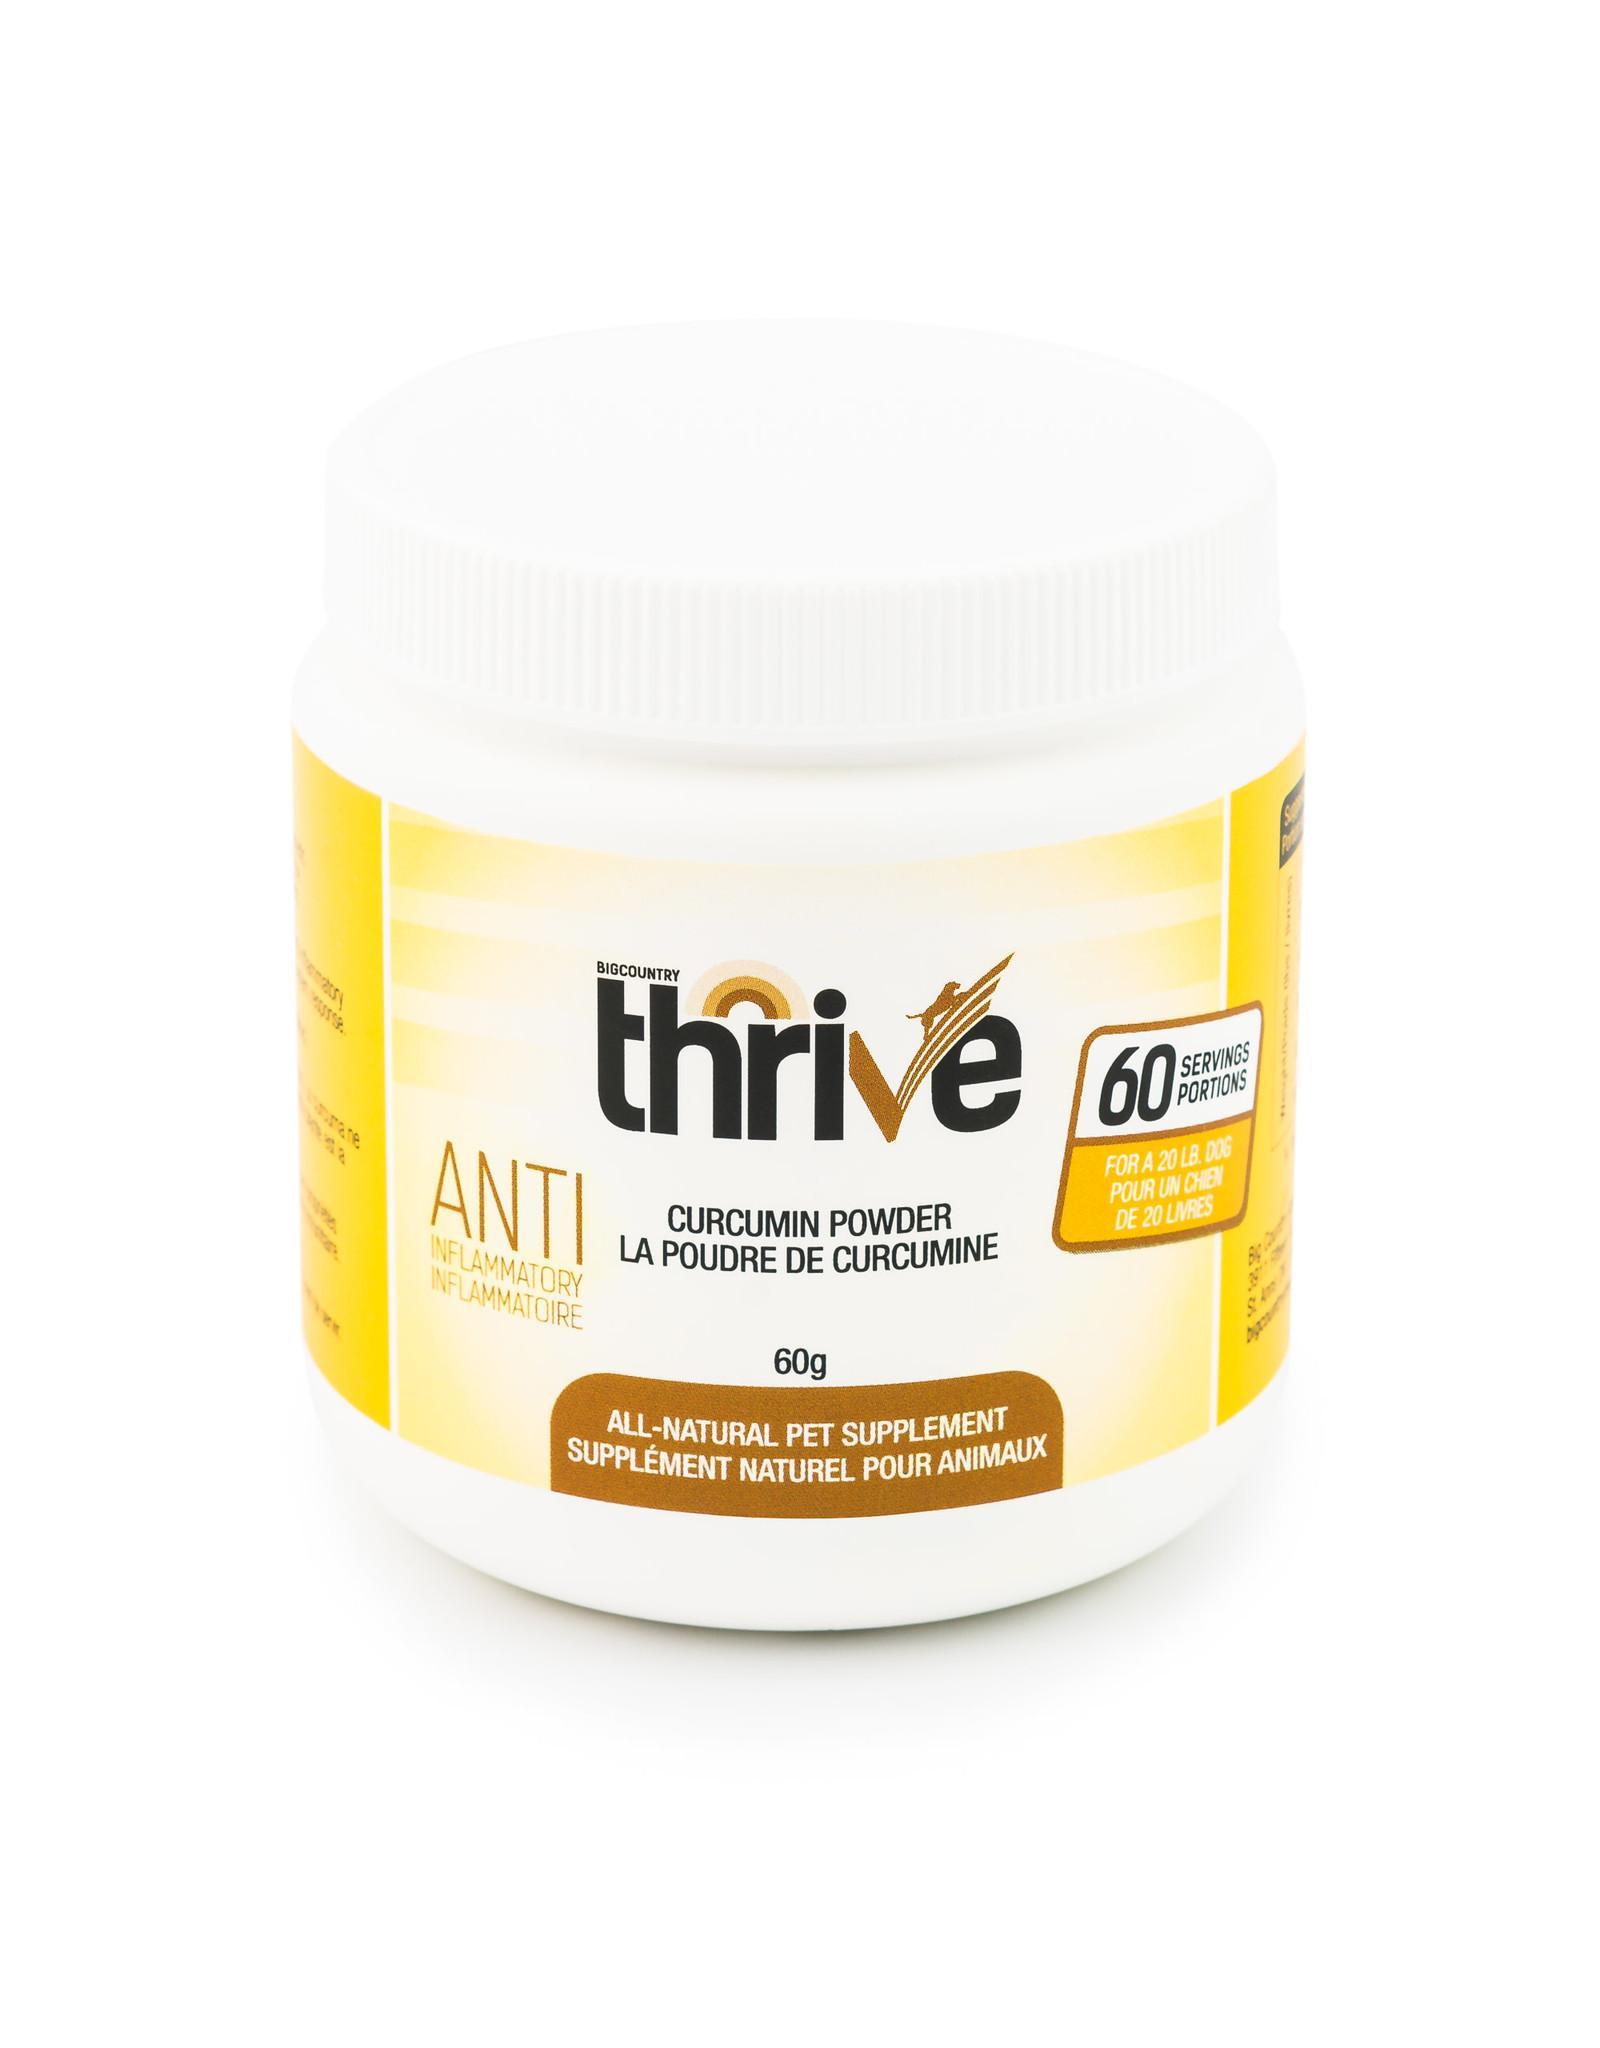 Thrive Curcumin Powder Dog & Cat Supplement, 60-gram